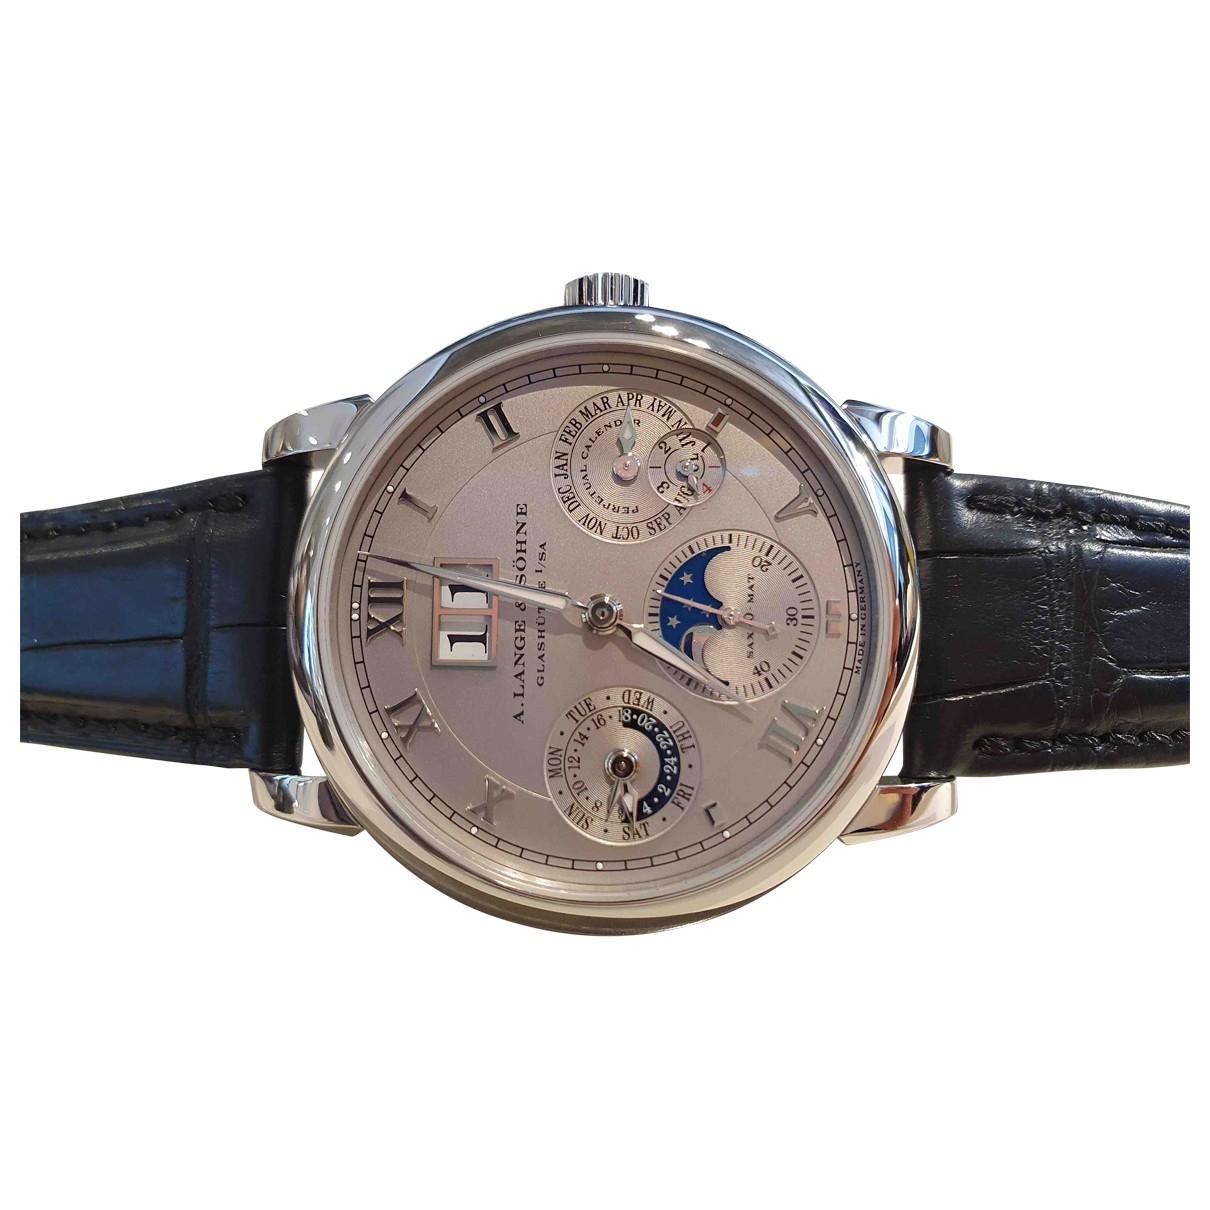 Relojes de Platino A. Lange & Sohne